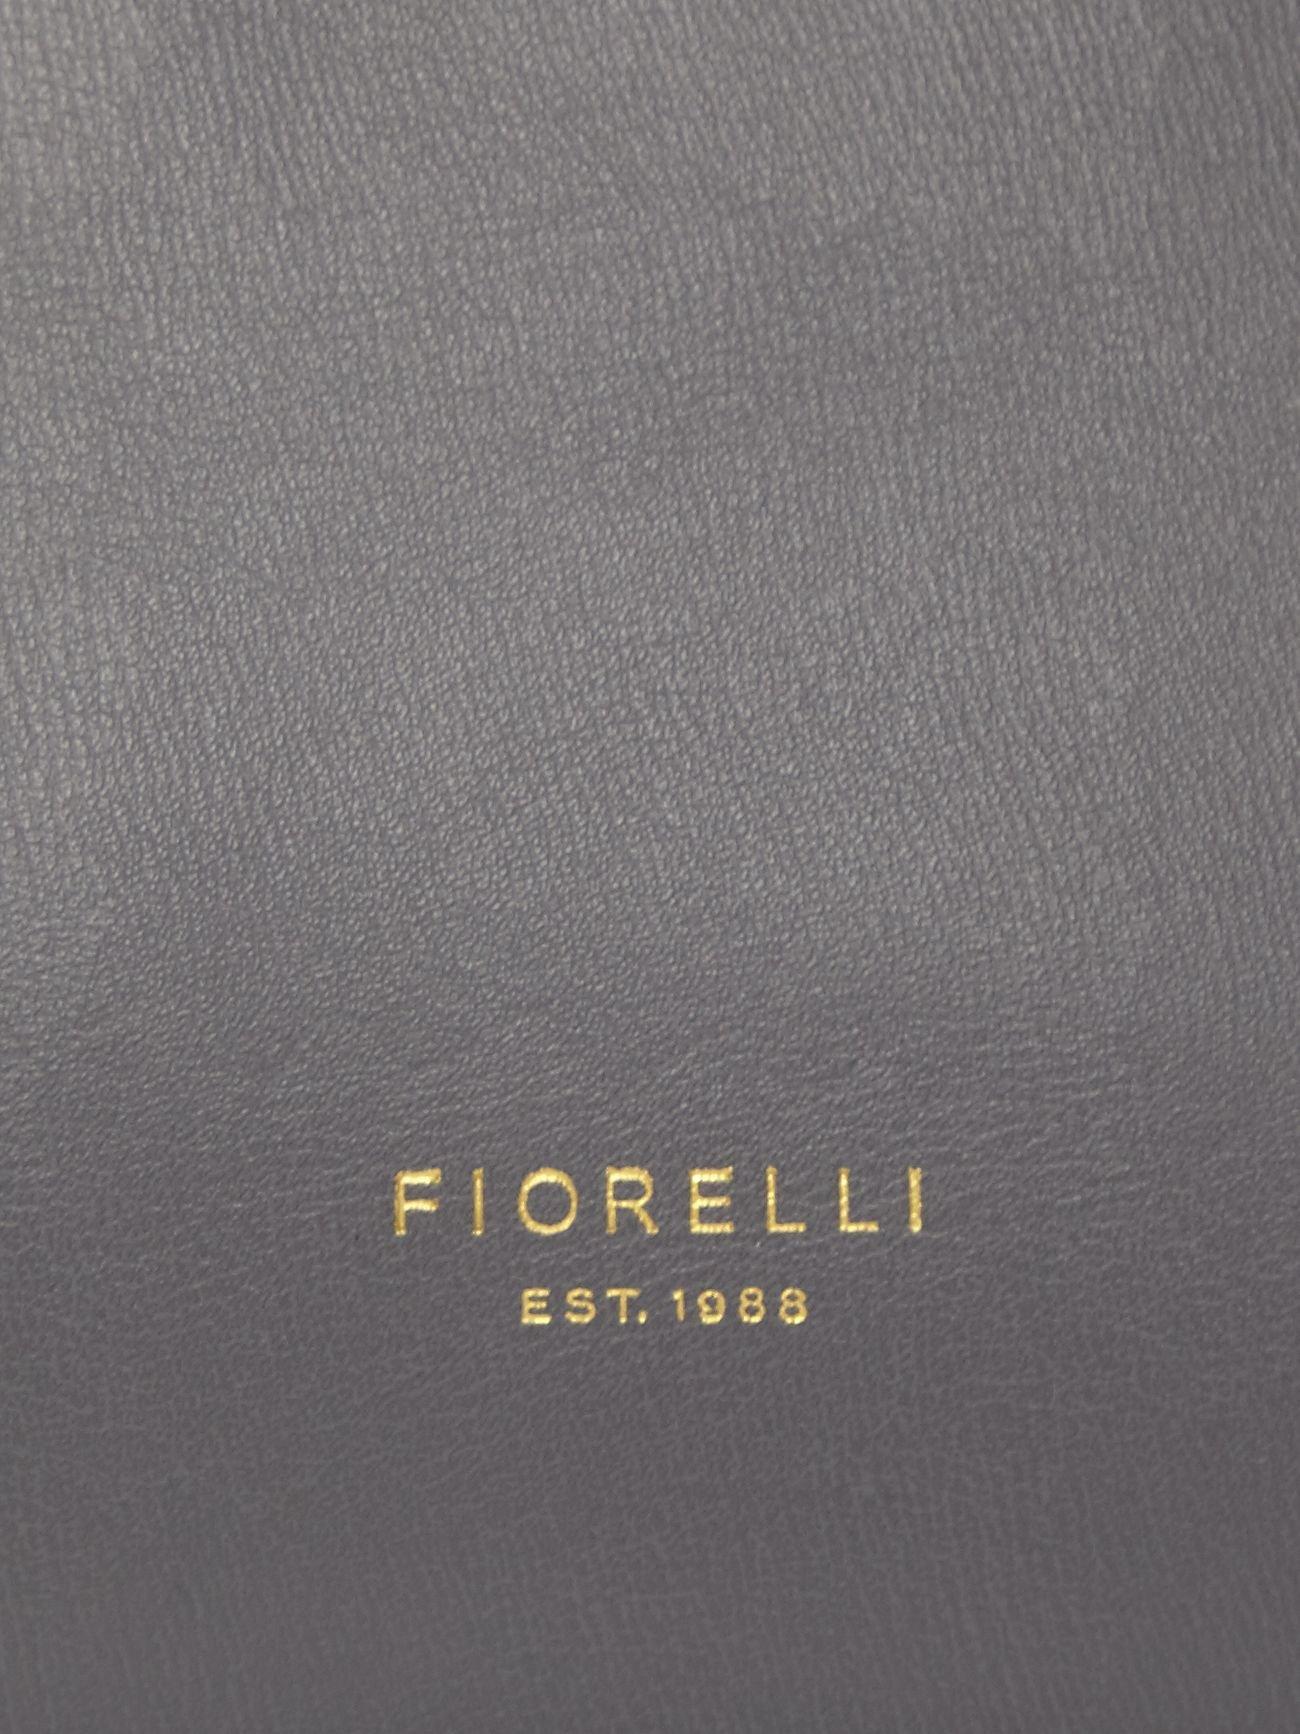 Fiorelli Brompton Grey Medium Tote Bag in Grey